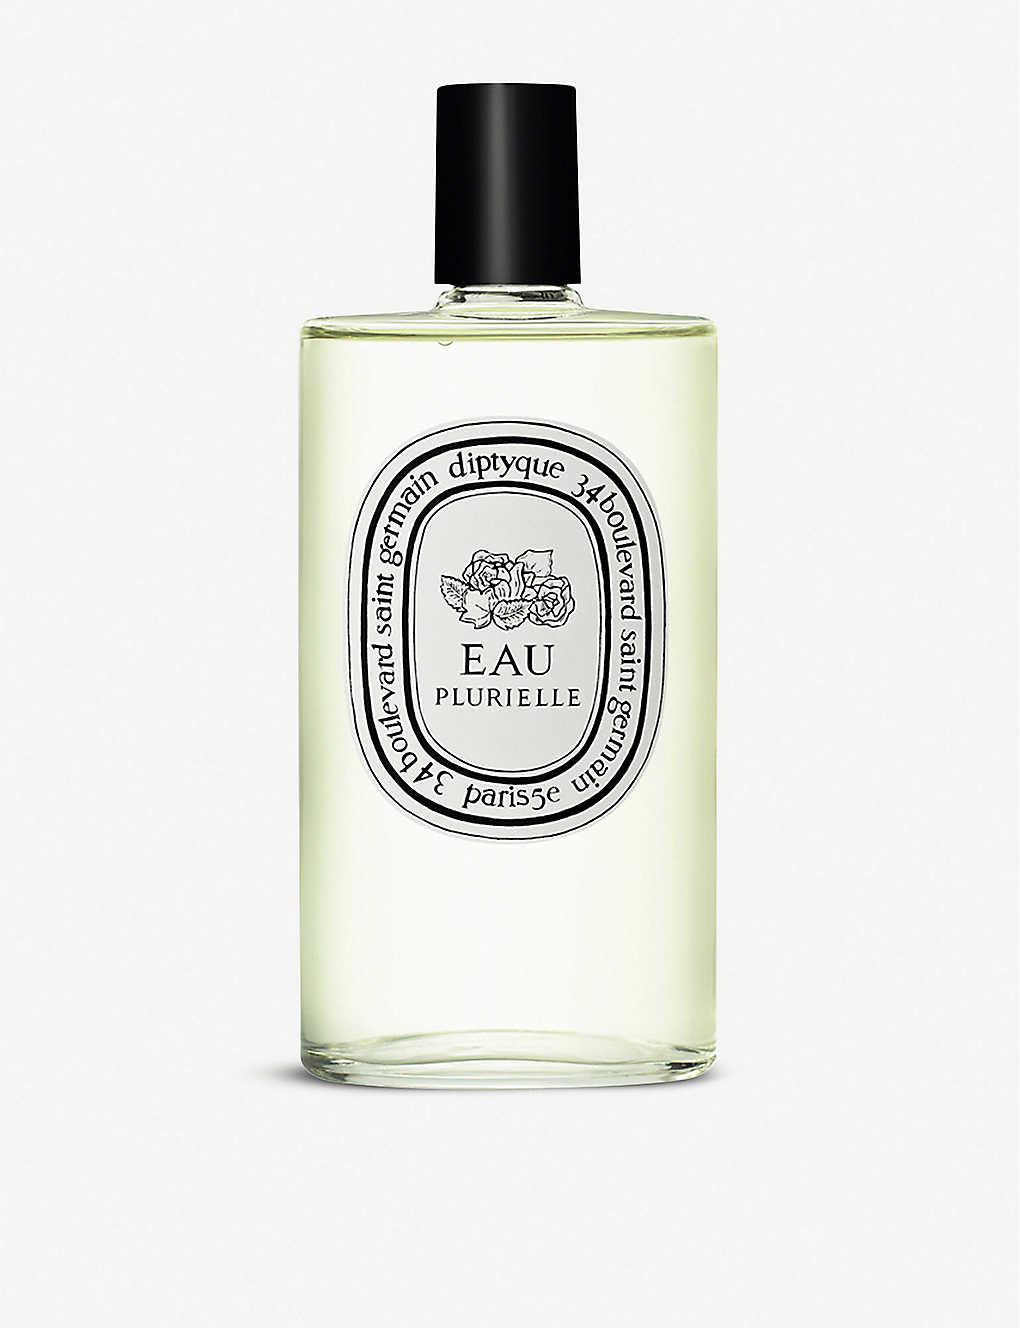 Eau Plurielle multi use fragrance 20ml